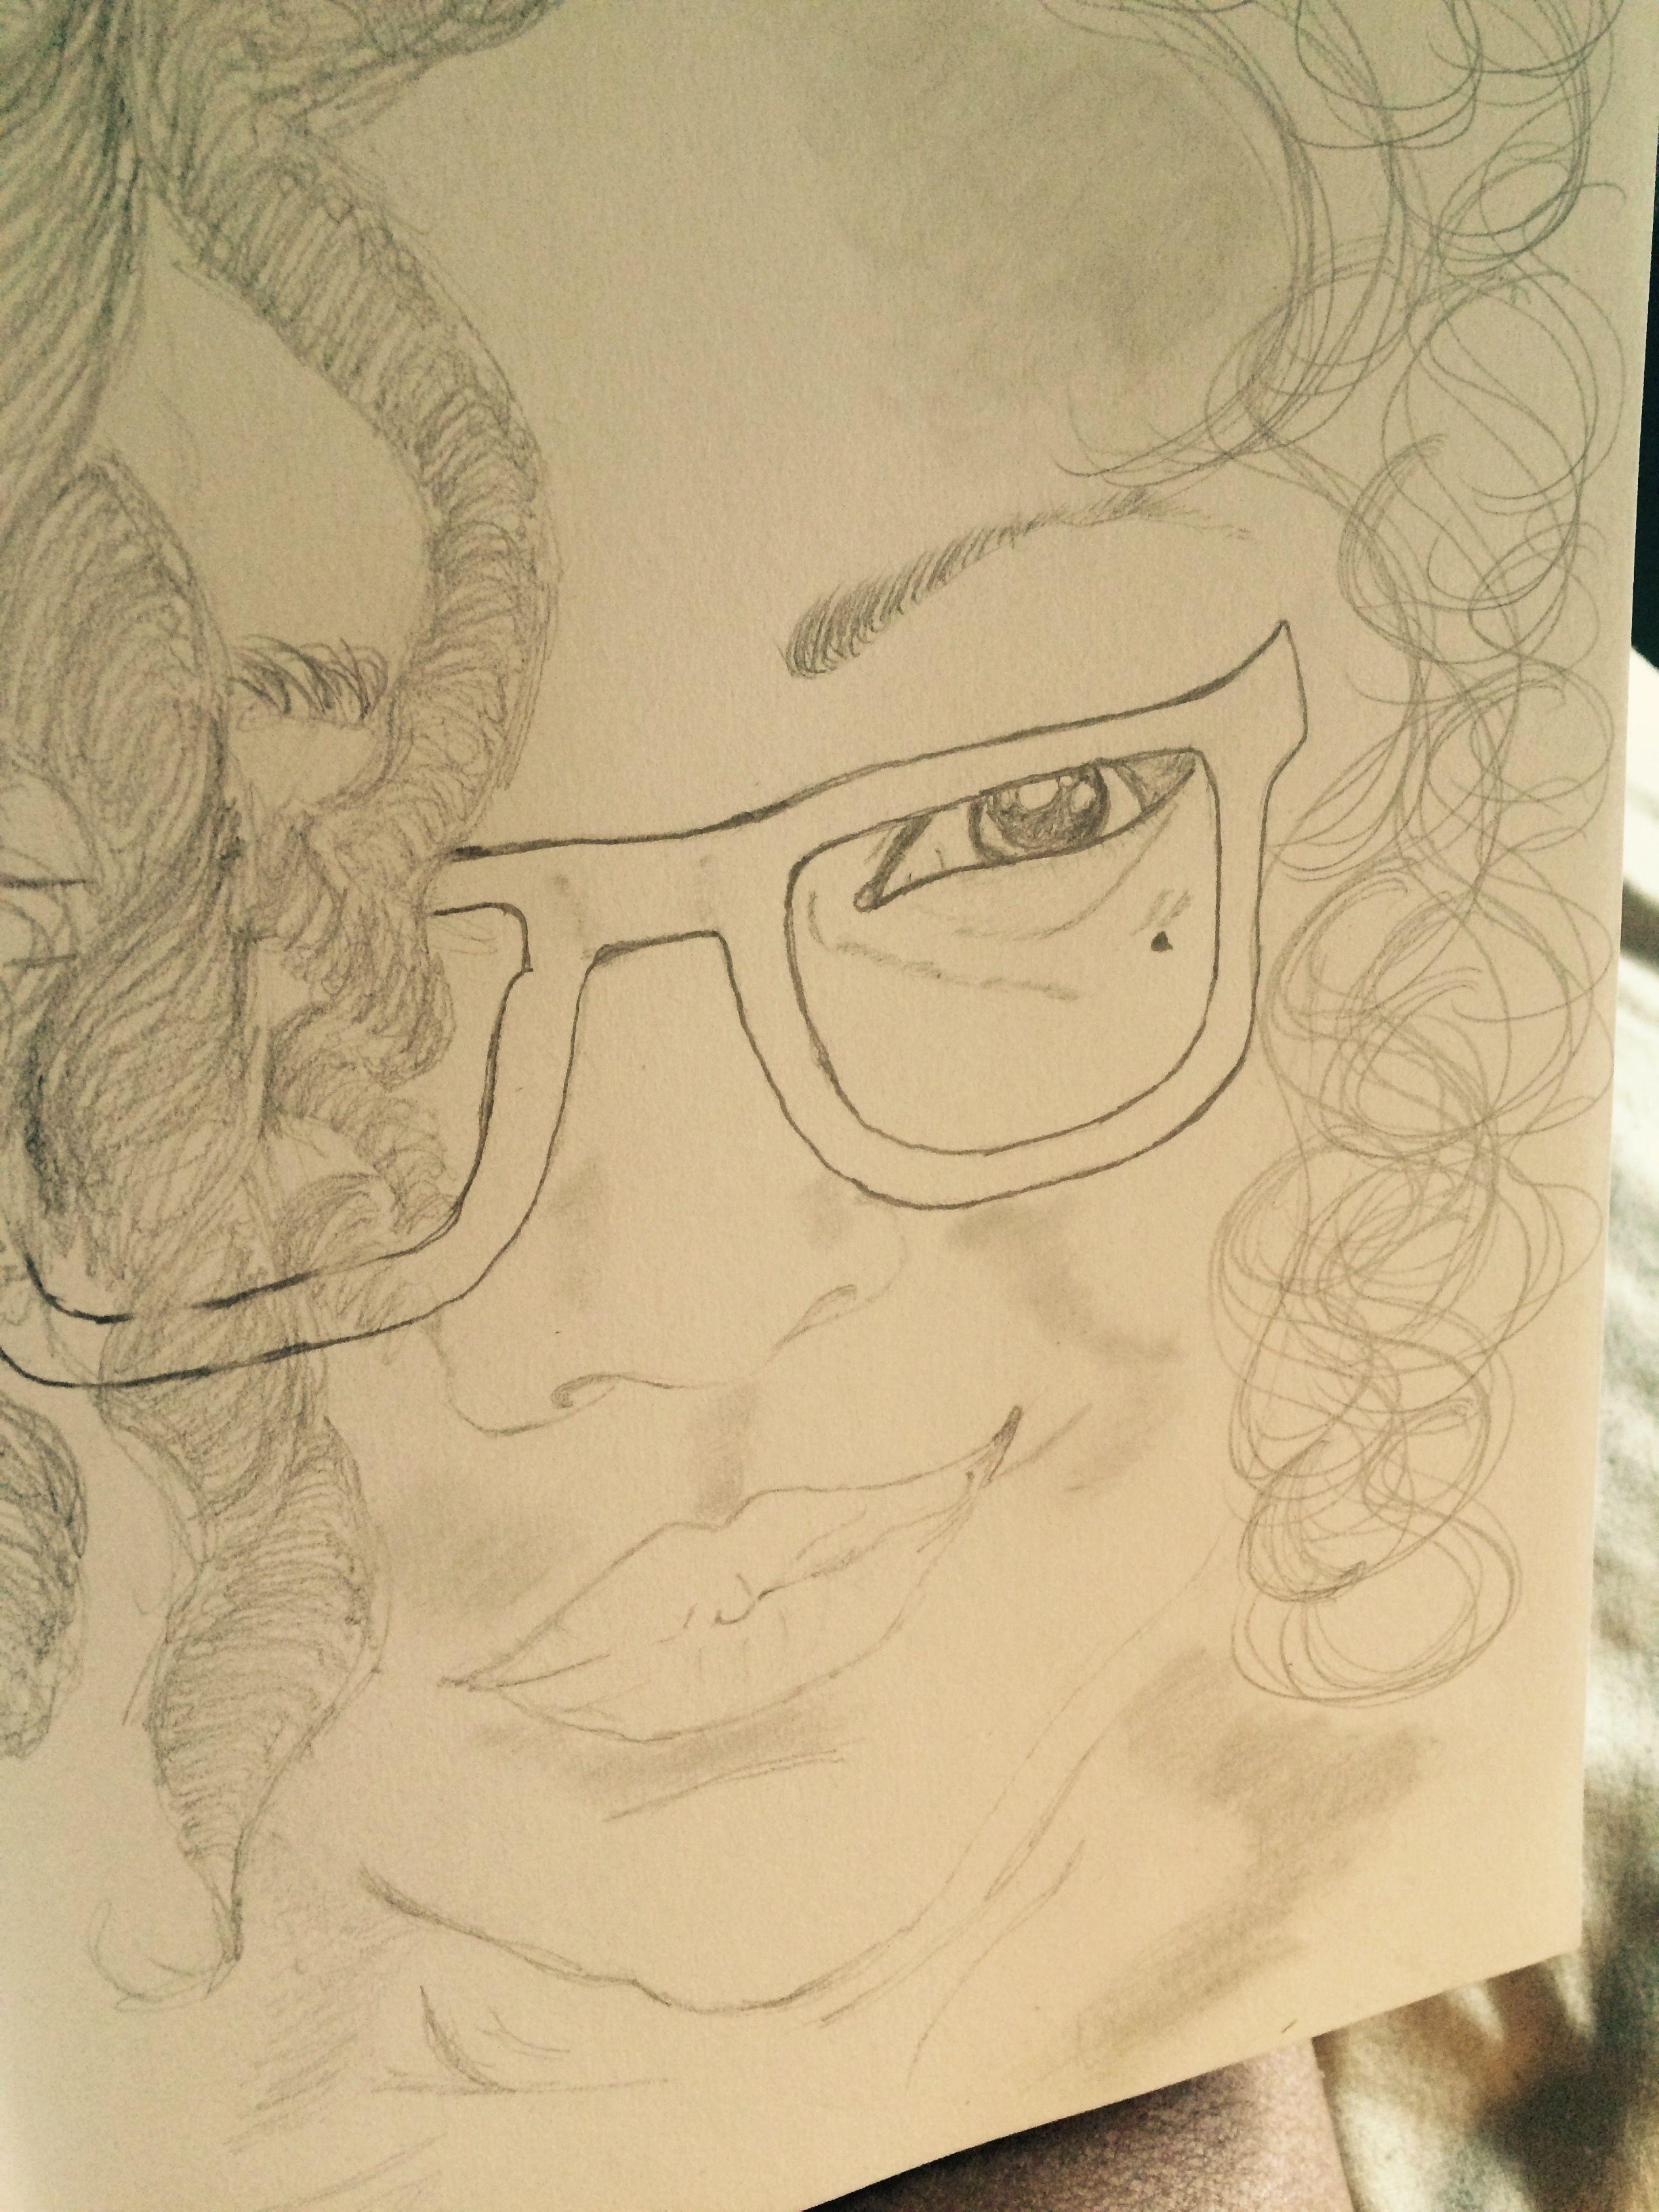 Sketch, art, drawing, wall art, self portrait, pencil, pencil ...